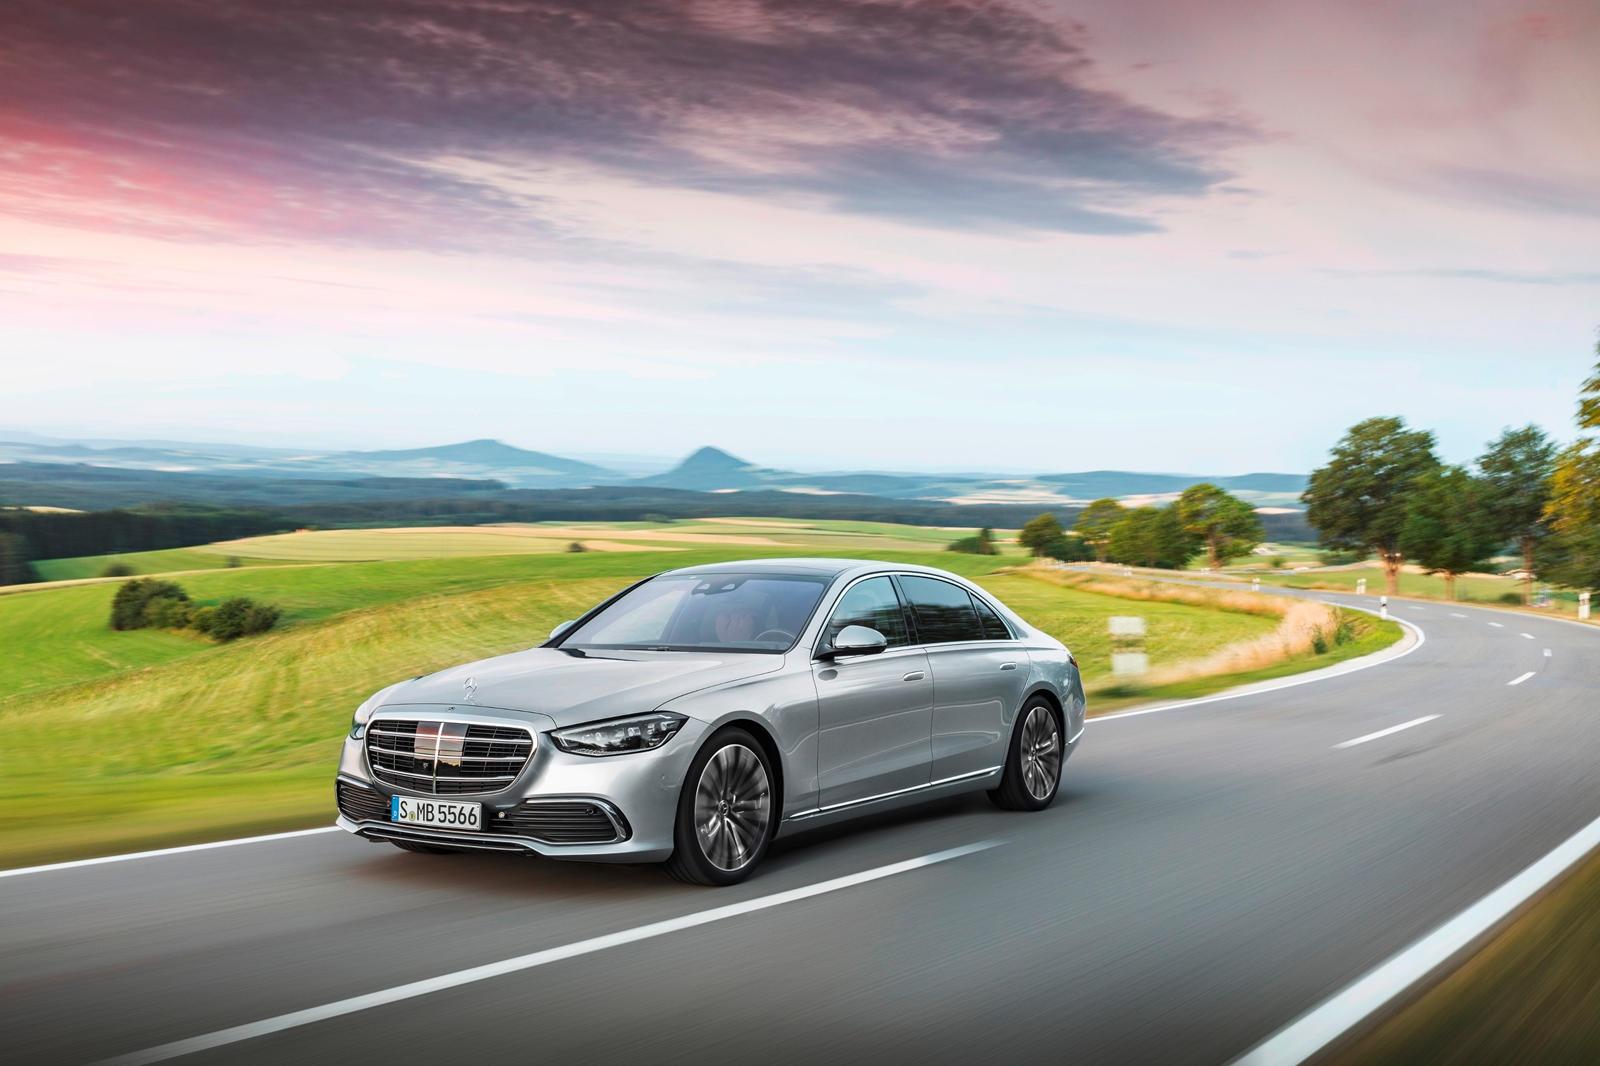 danh gia Mercedes-Benz S-Class 2021 anh 8